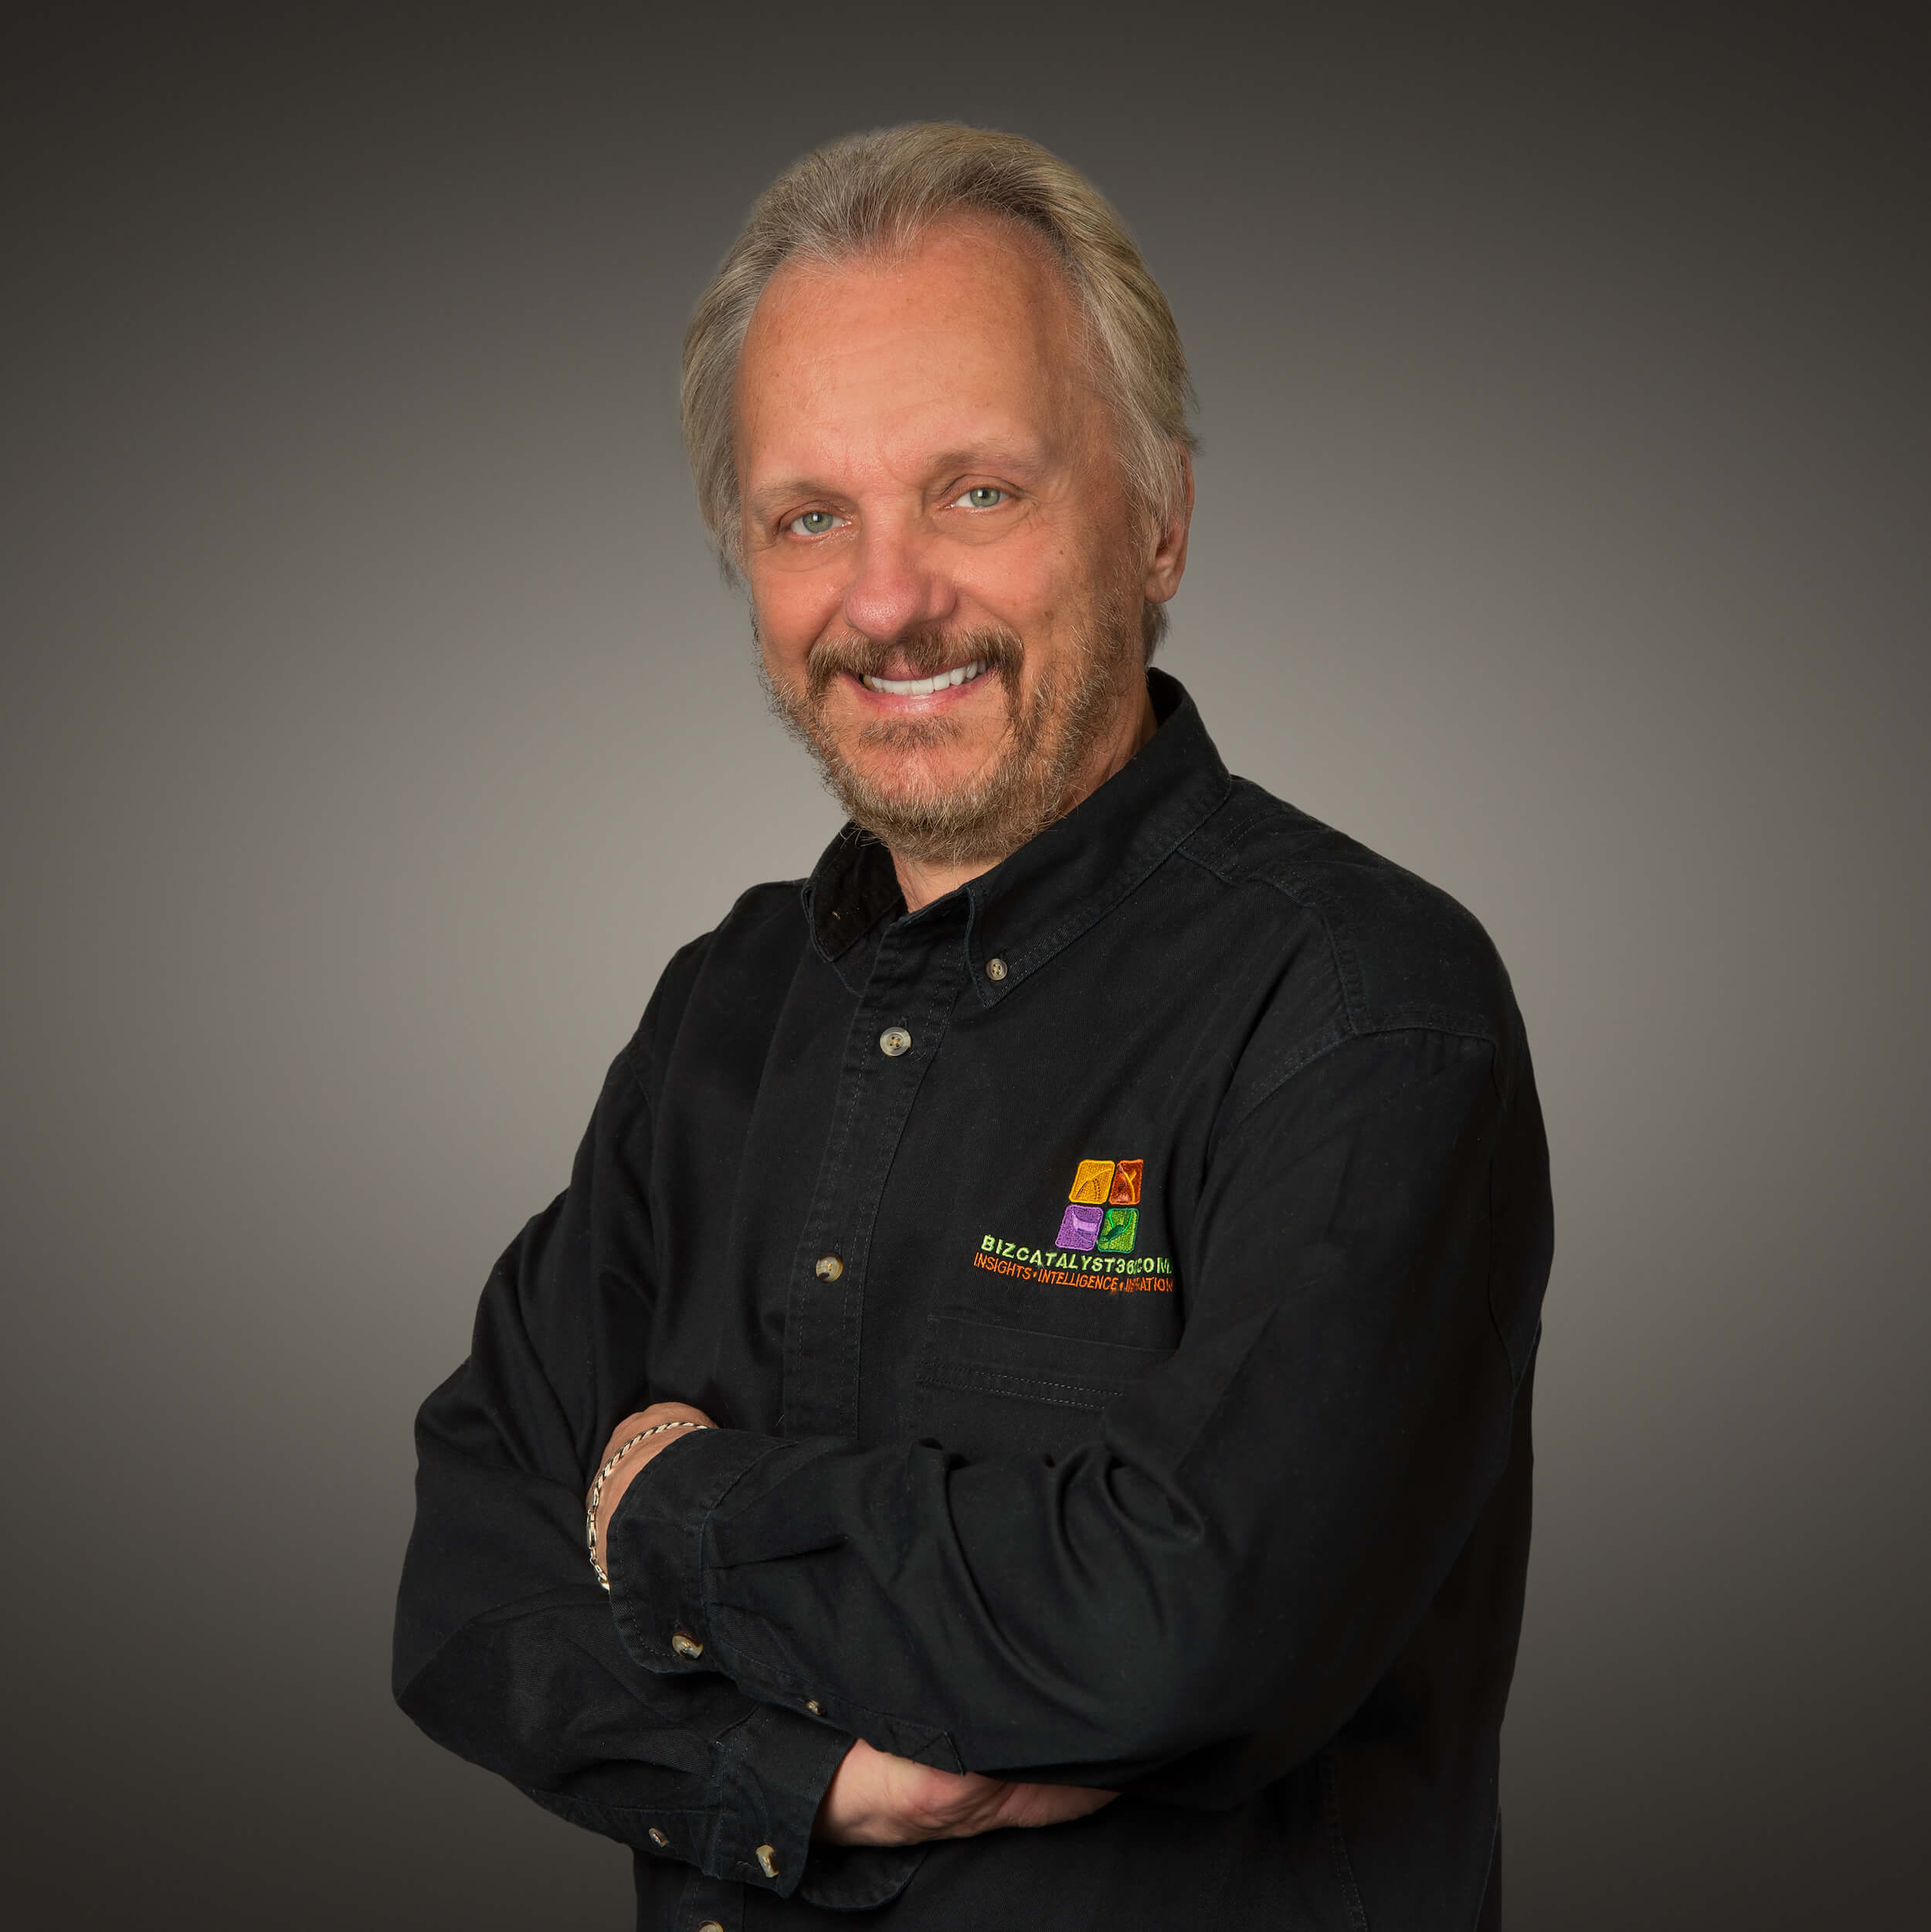 Dennis Pitocco